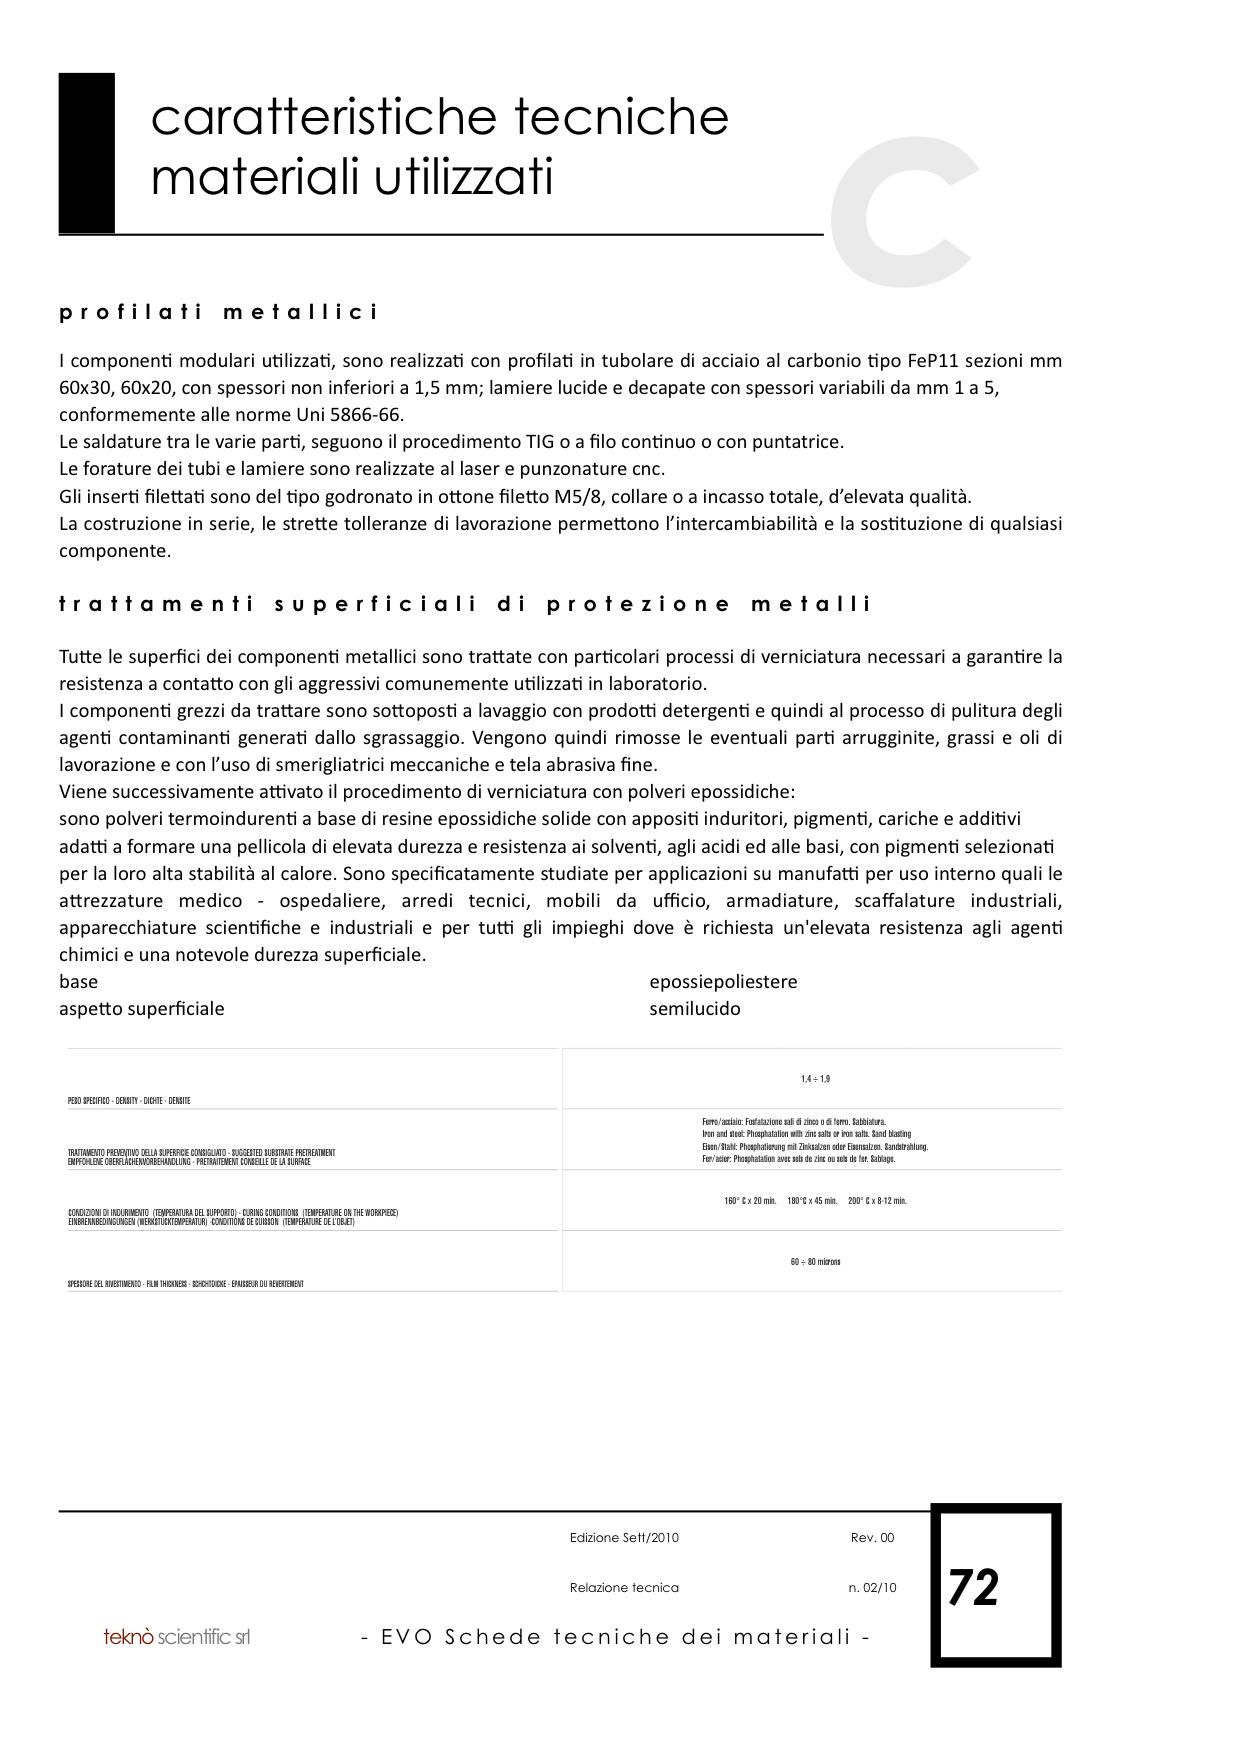 EVO Schede Tecniche materiali copia 2.png